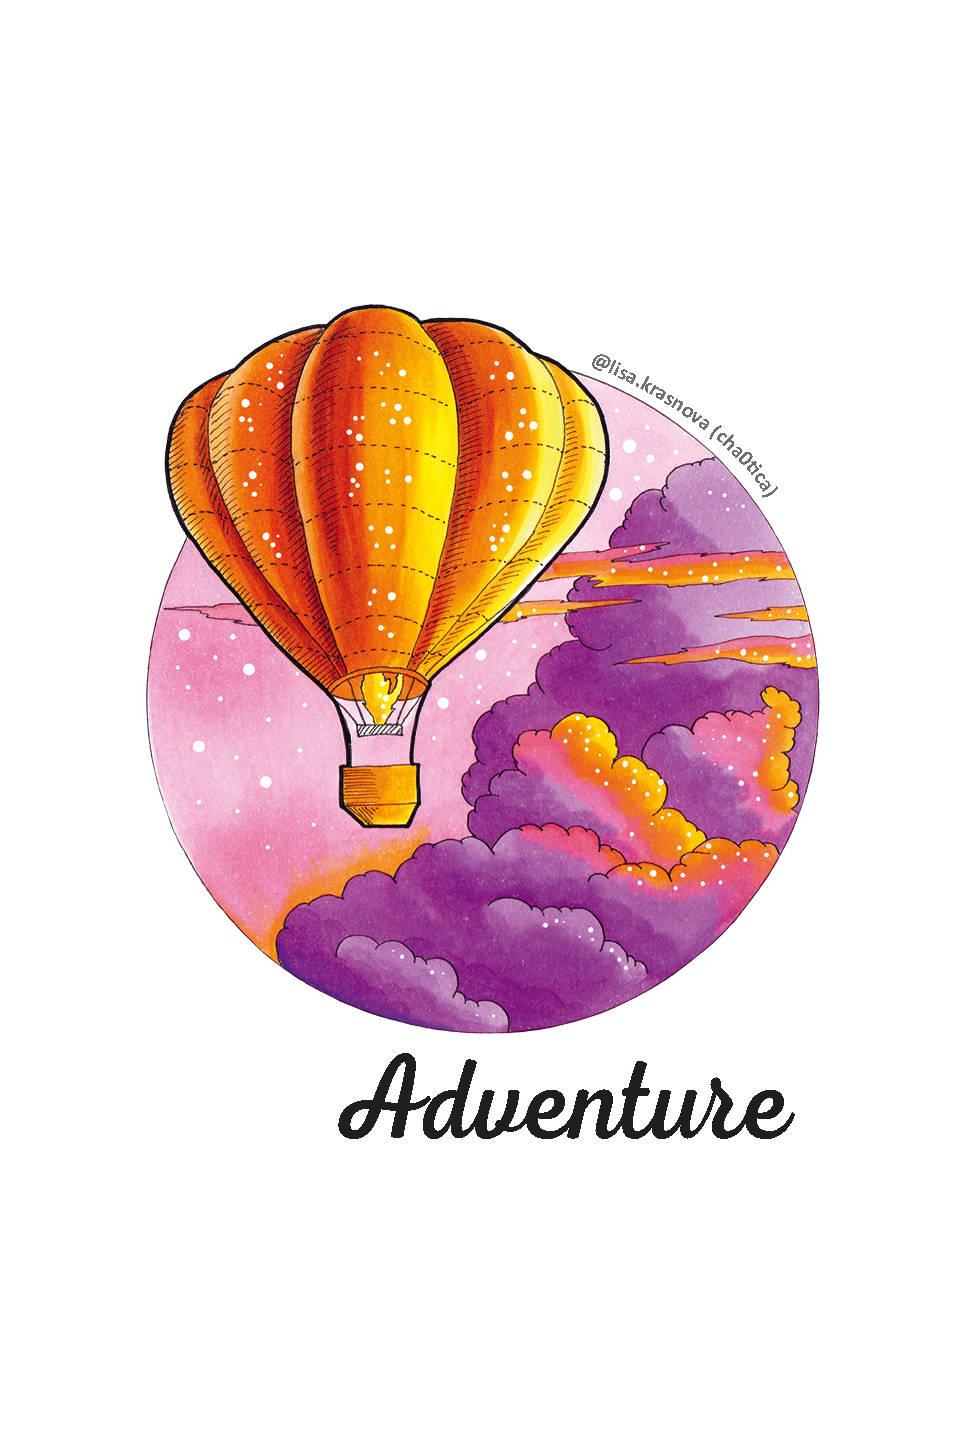 Блокнот Adventure. Скетчи Лизы Красновой блокнот summer скетчи лизы красновой